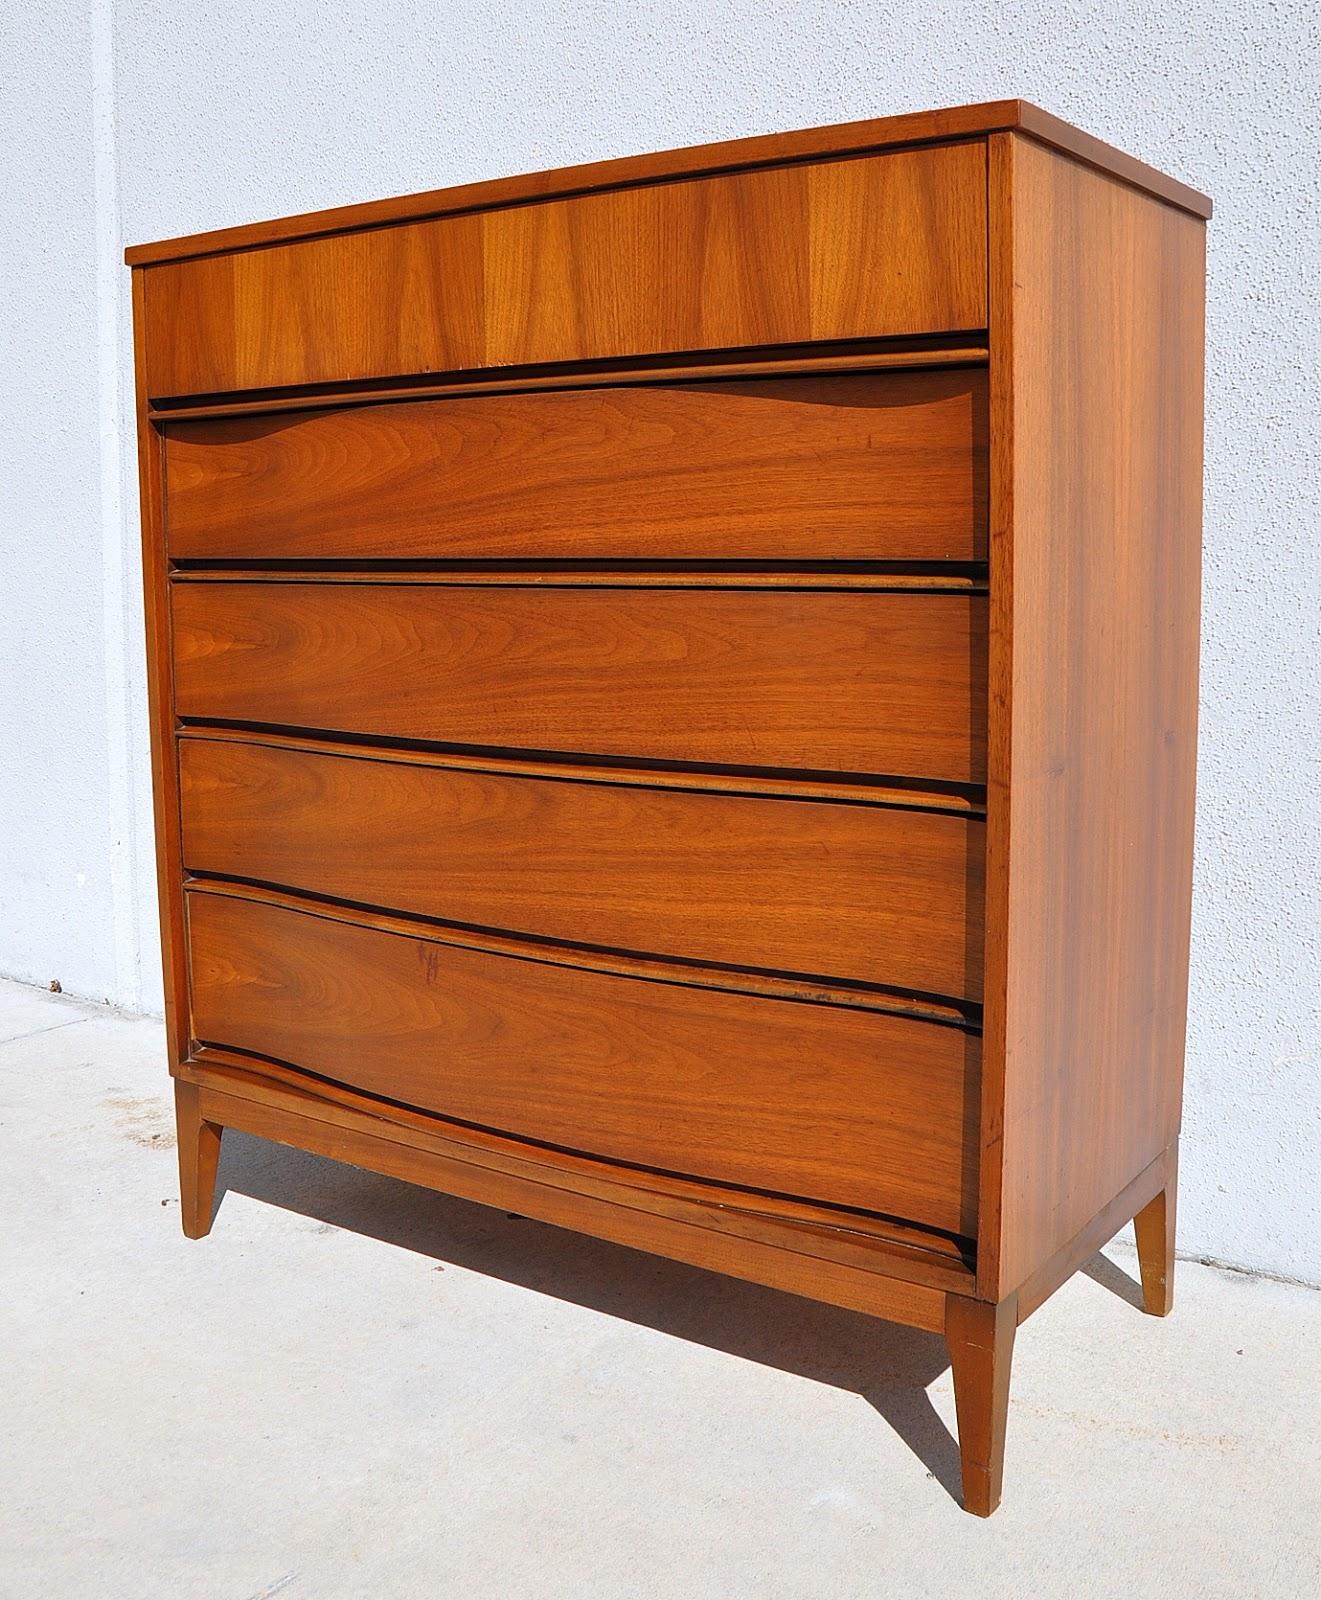 Mid Century Modern Highboy Dresser / Chest Of Drawers